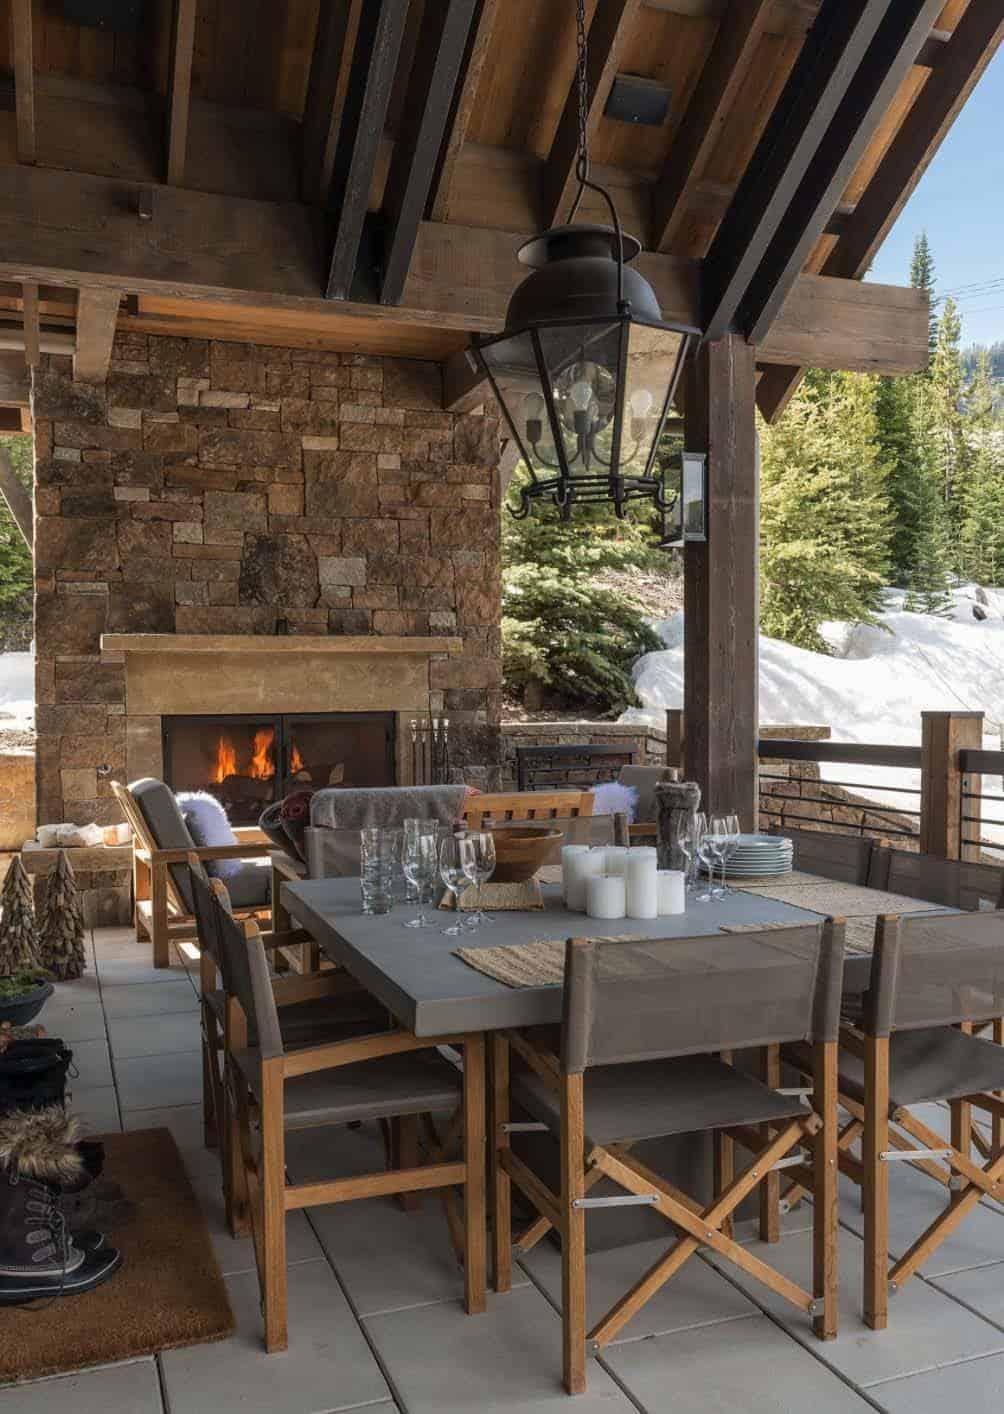 Patio Furniture For Cabin